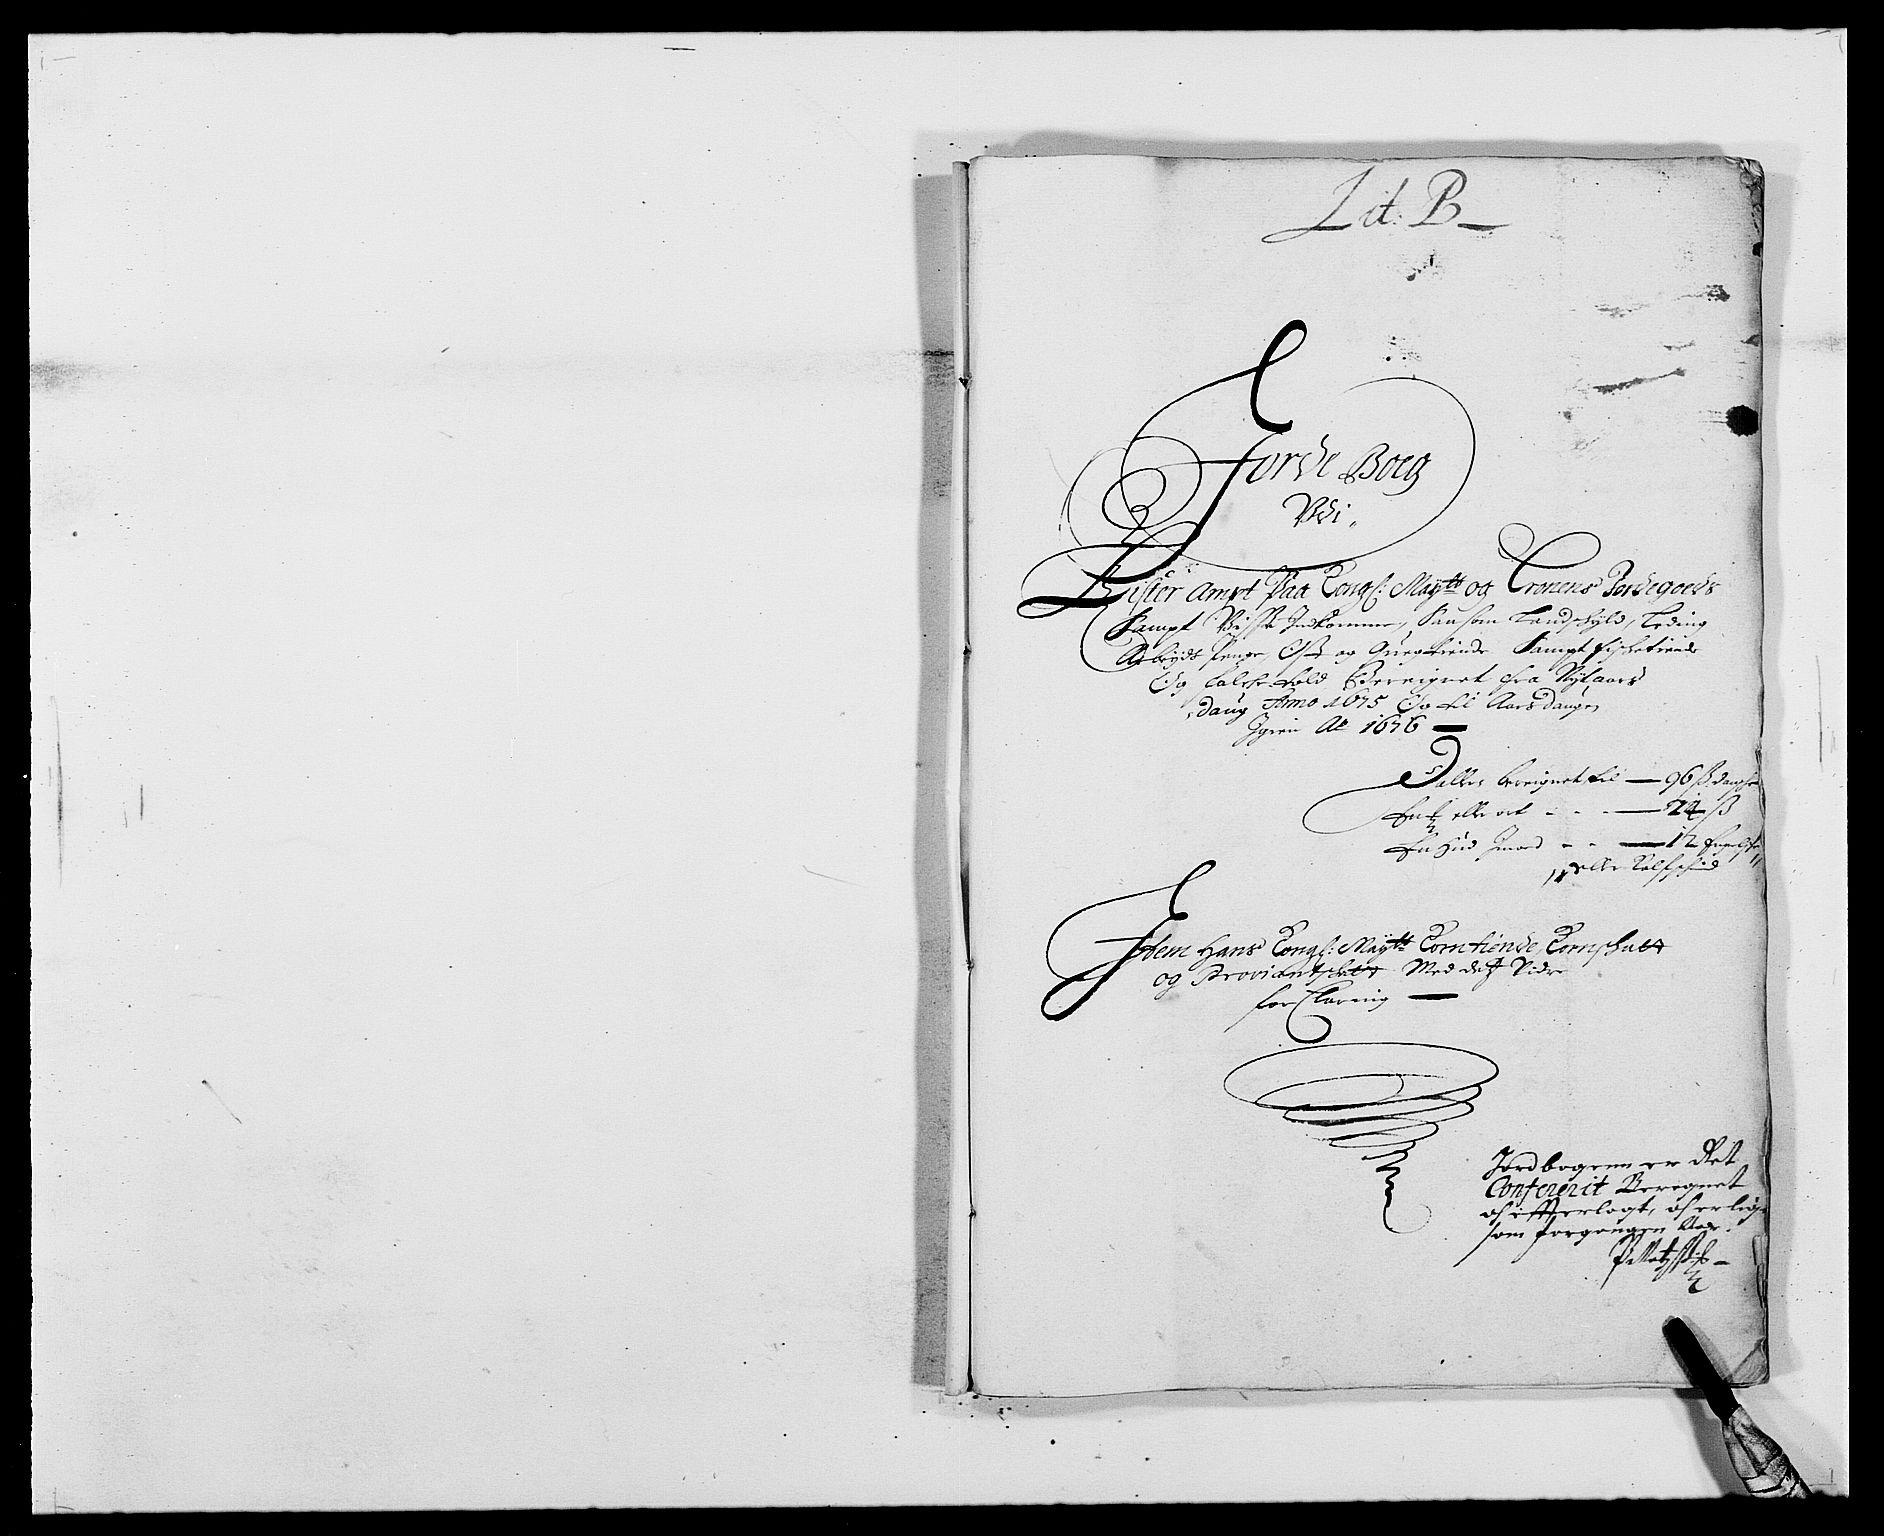 RA, Rentekammeret inntil 1814, Reviderte regnskaper, Fogderegnskap, R41/L2529: Fogderegnskap Lista, 1675-1676, s. 8